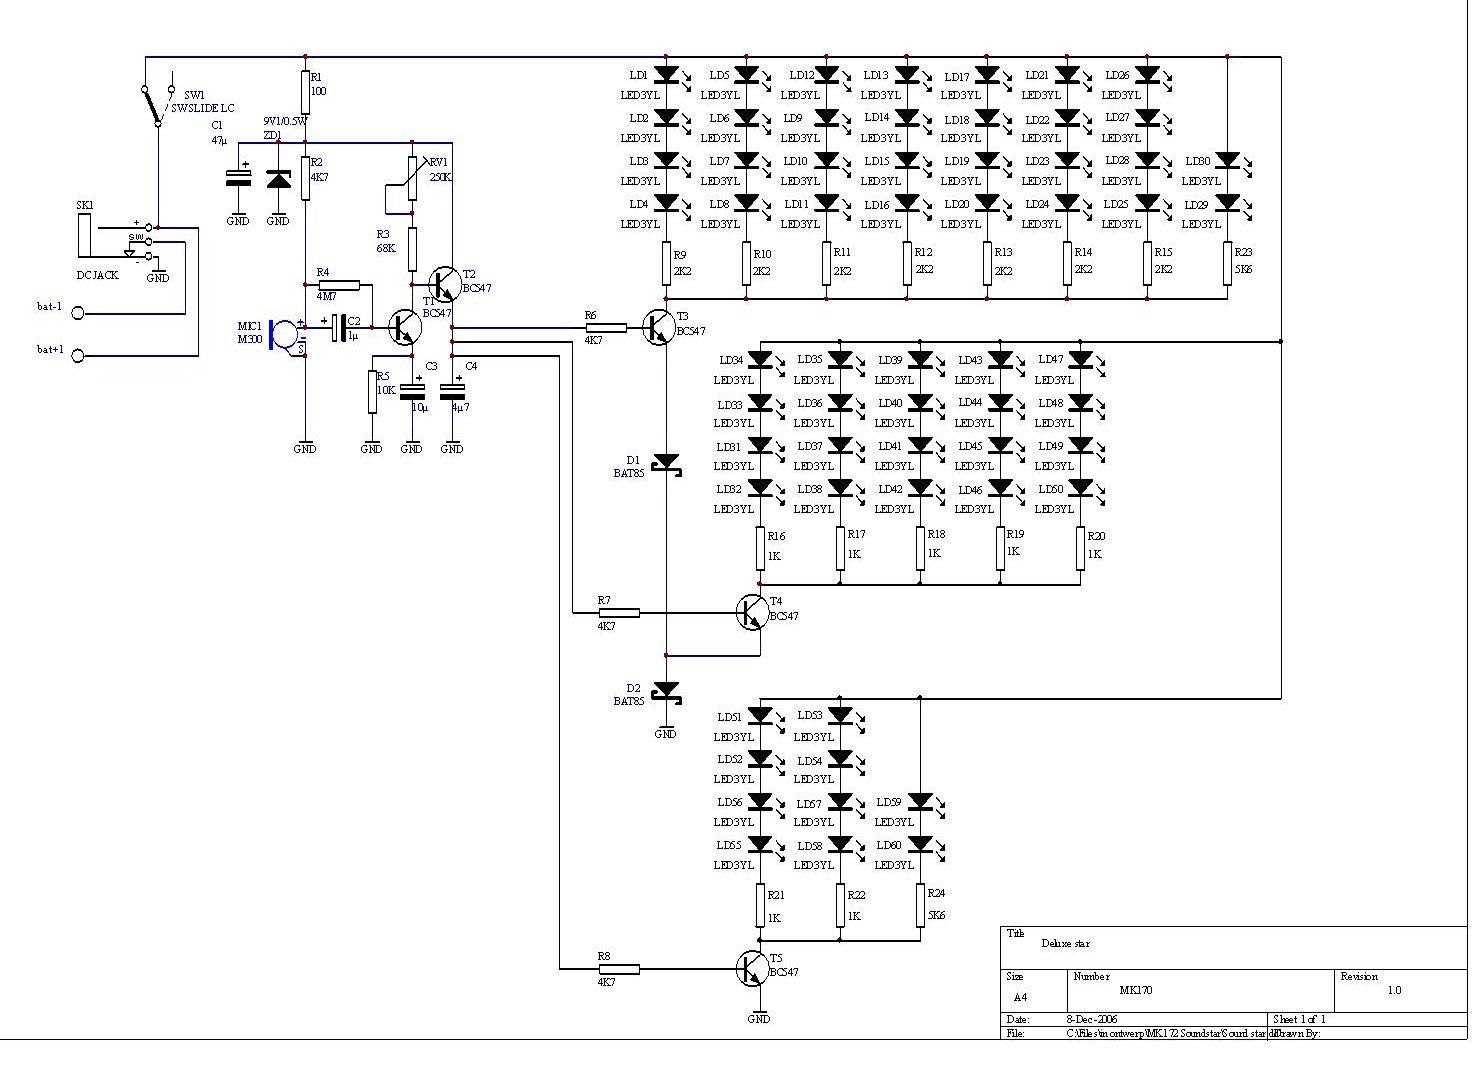 simple traffic light diagram 1997 subaru legacy outback radio wiring arduino schematic